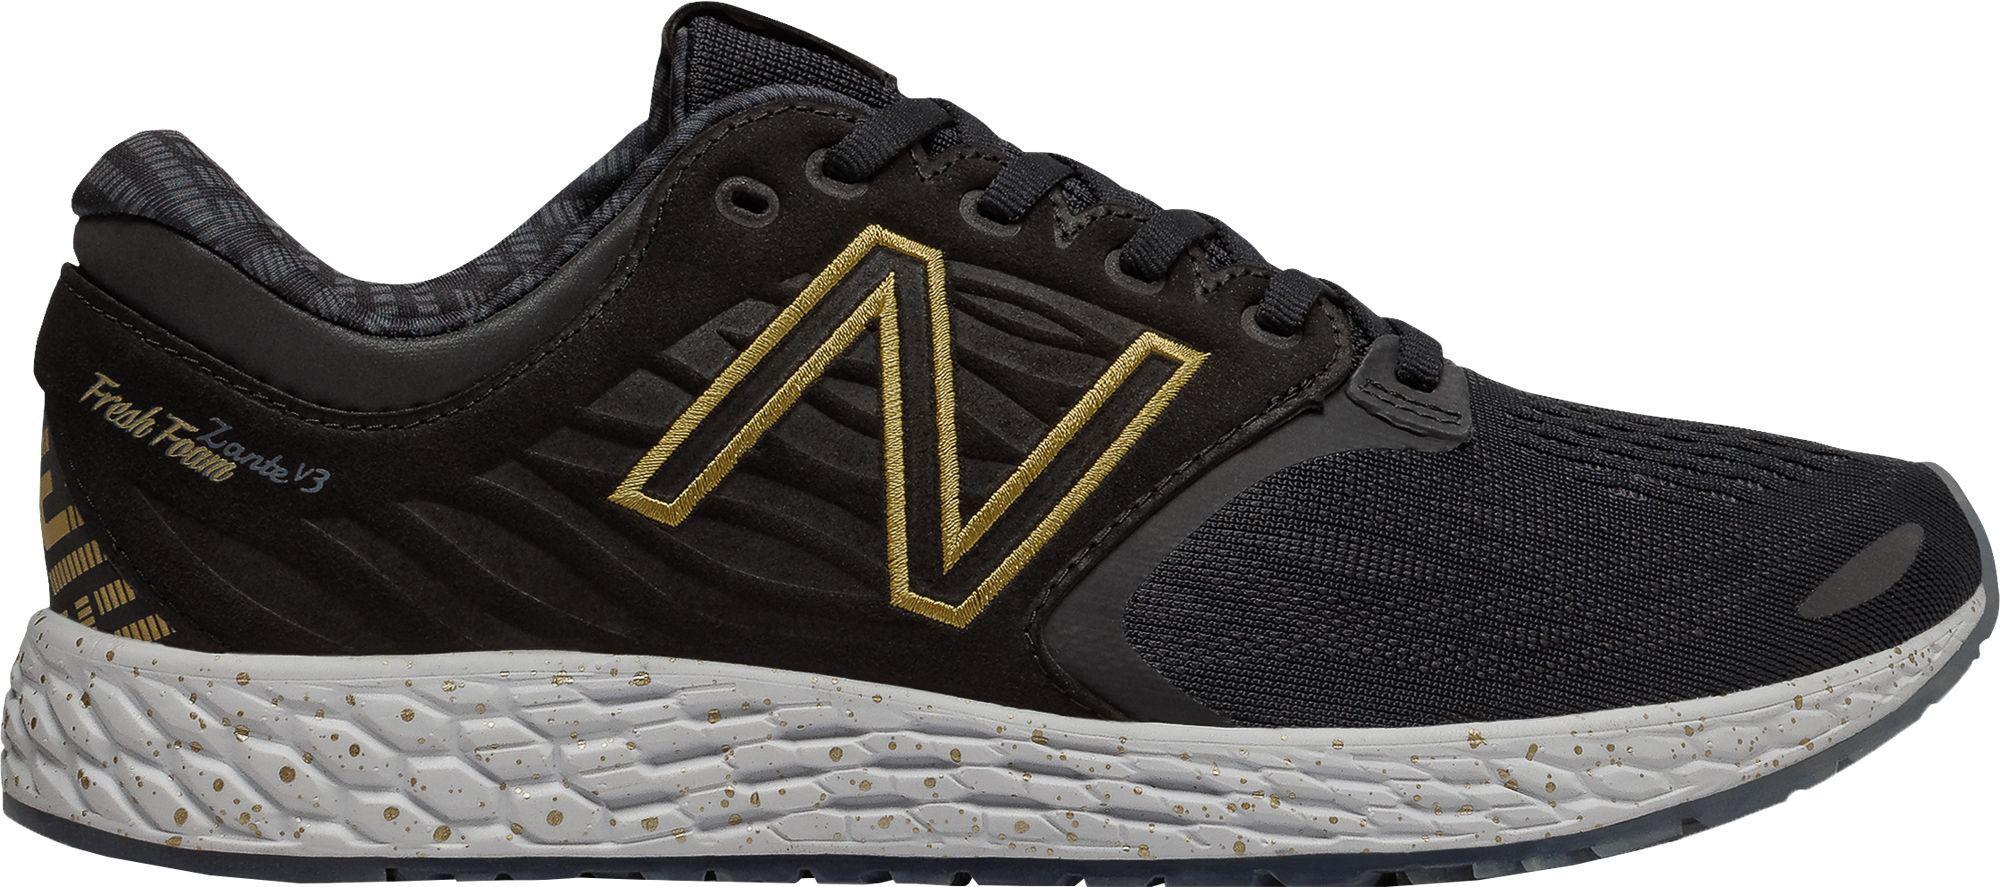 7ecf44667c27a ... czech lyst new balance fresh foam zante v3 nyc marathon running shoes  in a9482 9ee0f ...